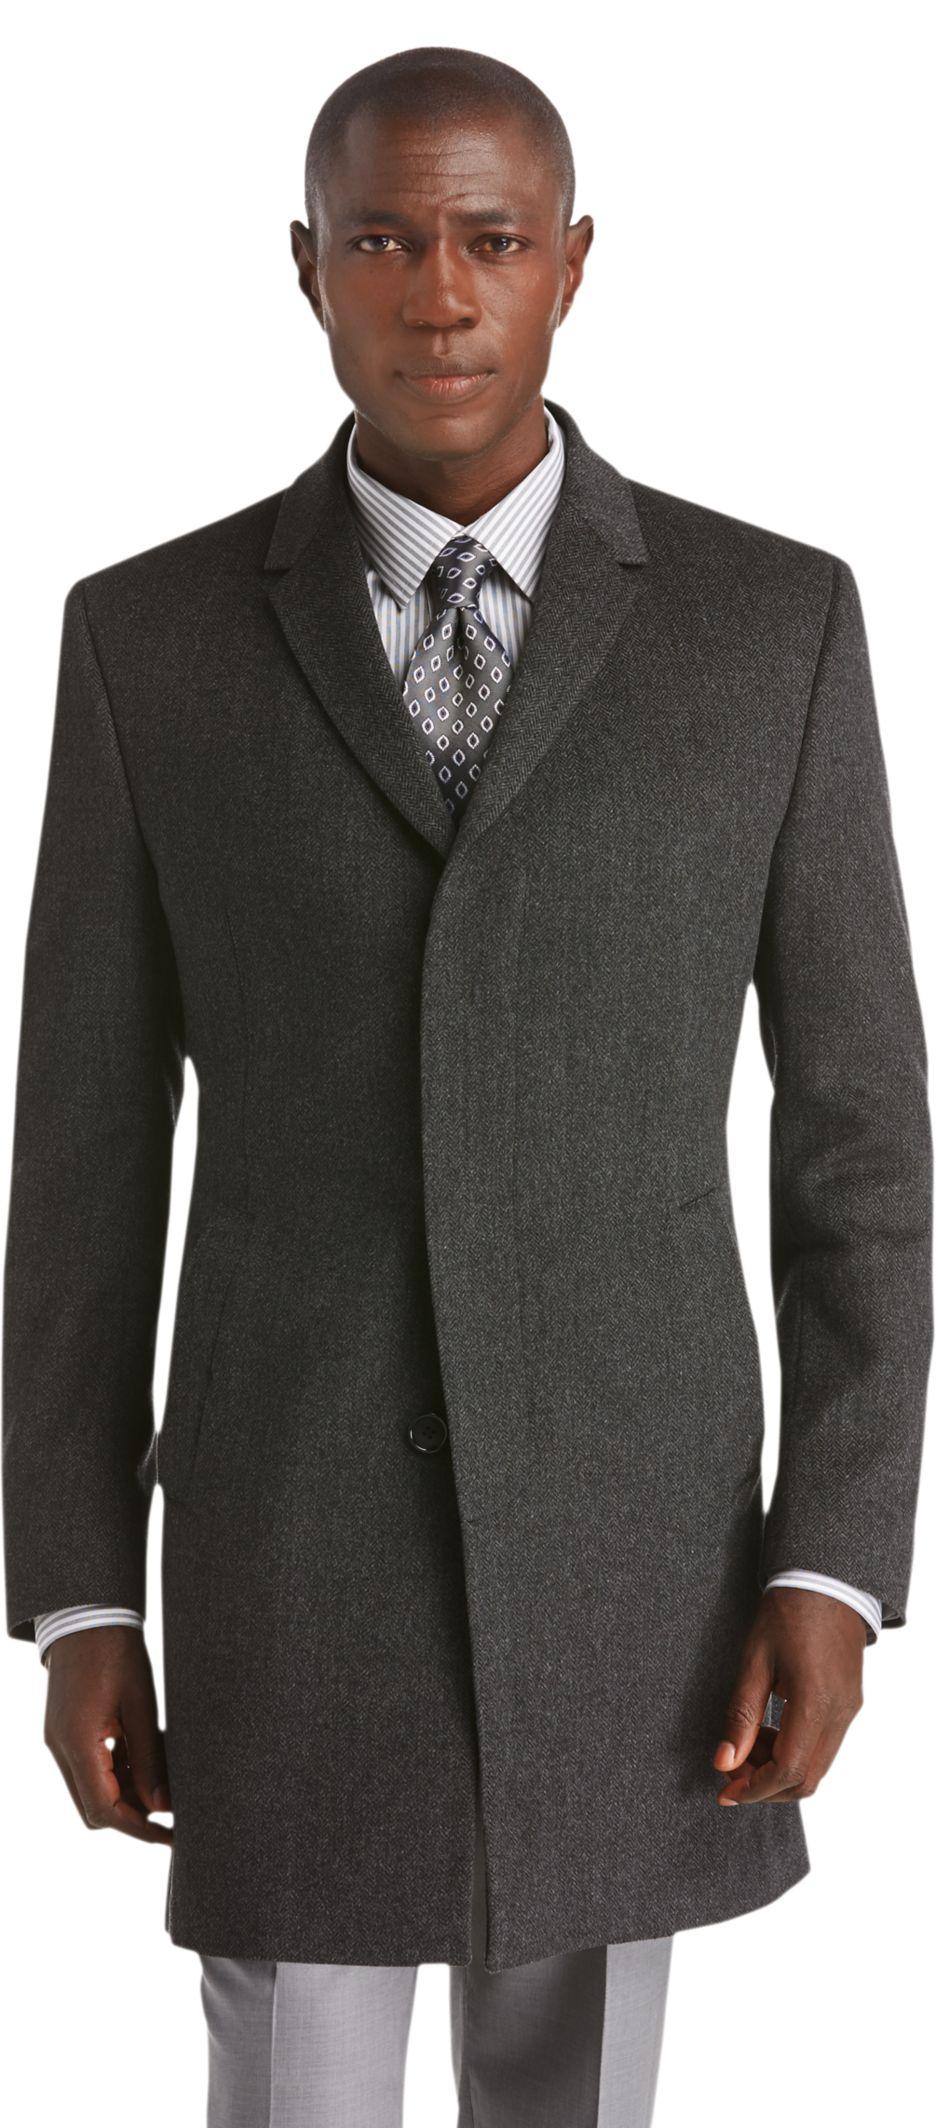 Men&39s Overcoats &amp Topcoats   Men&39s Outerwear   JoS. A. Bank Clothiers